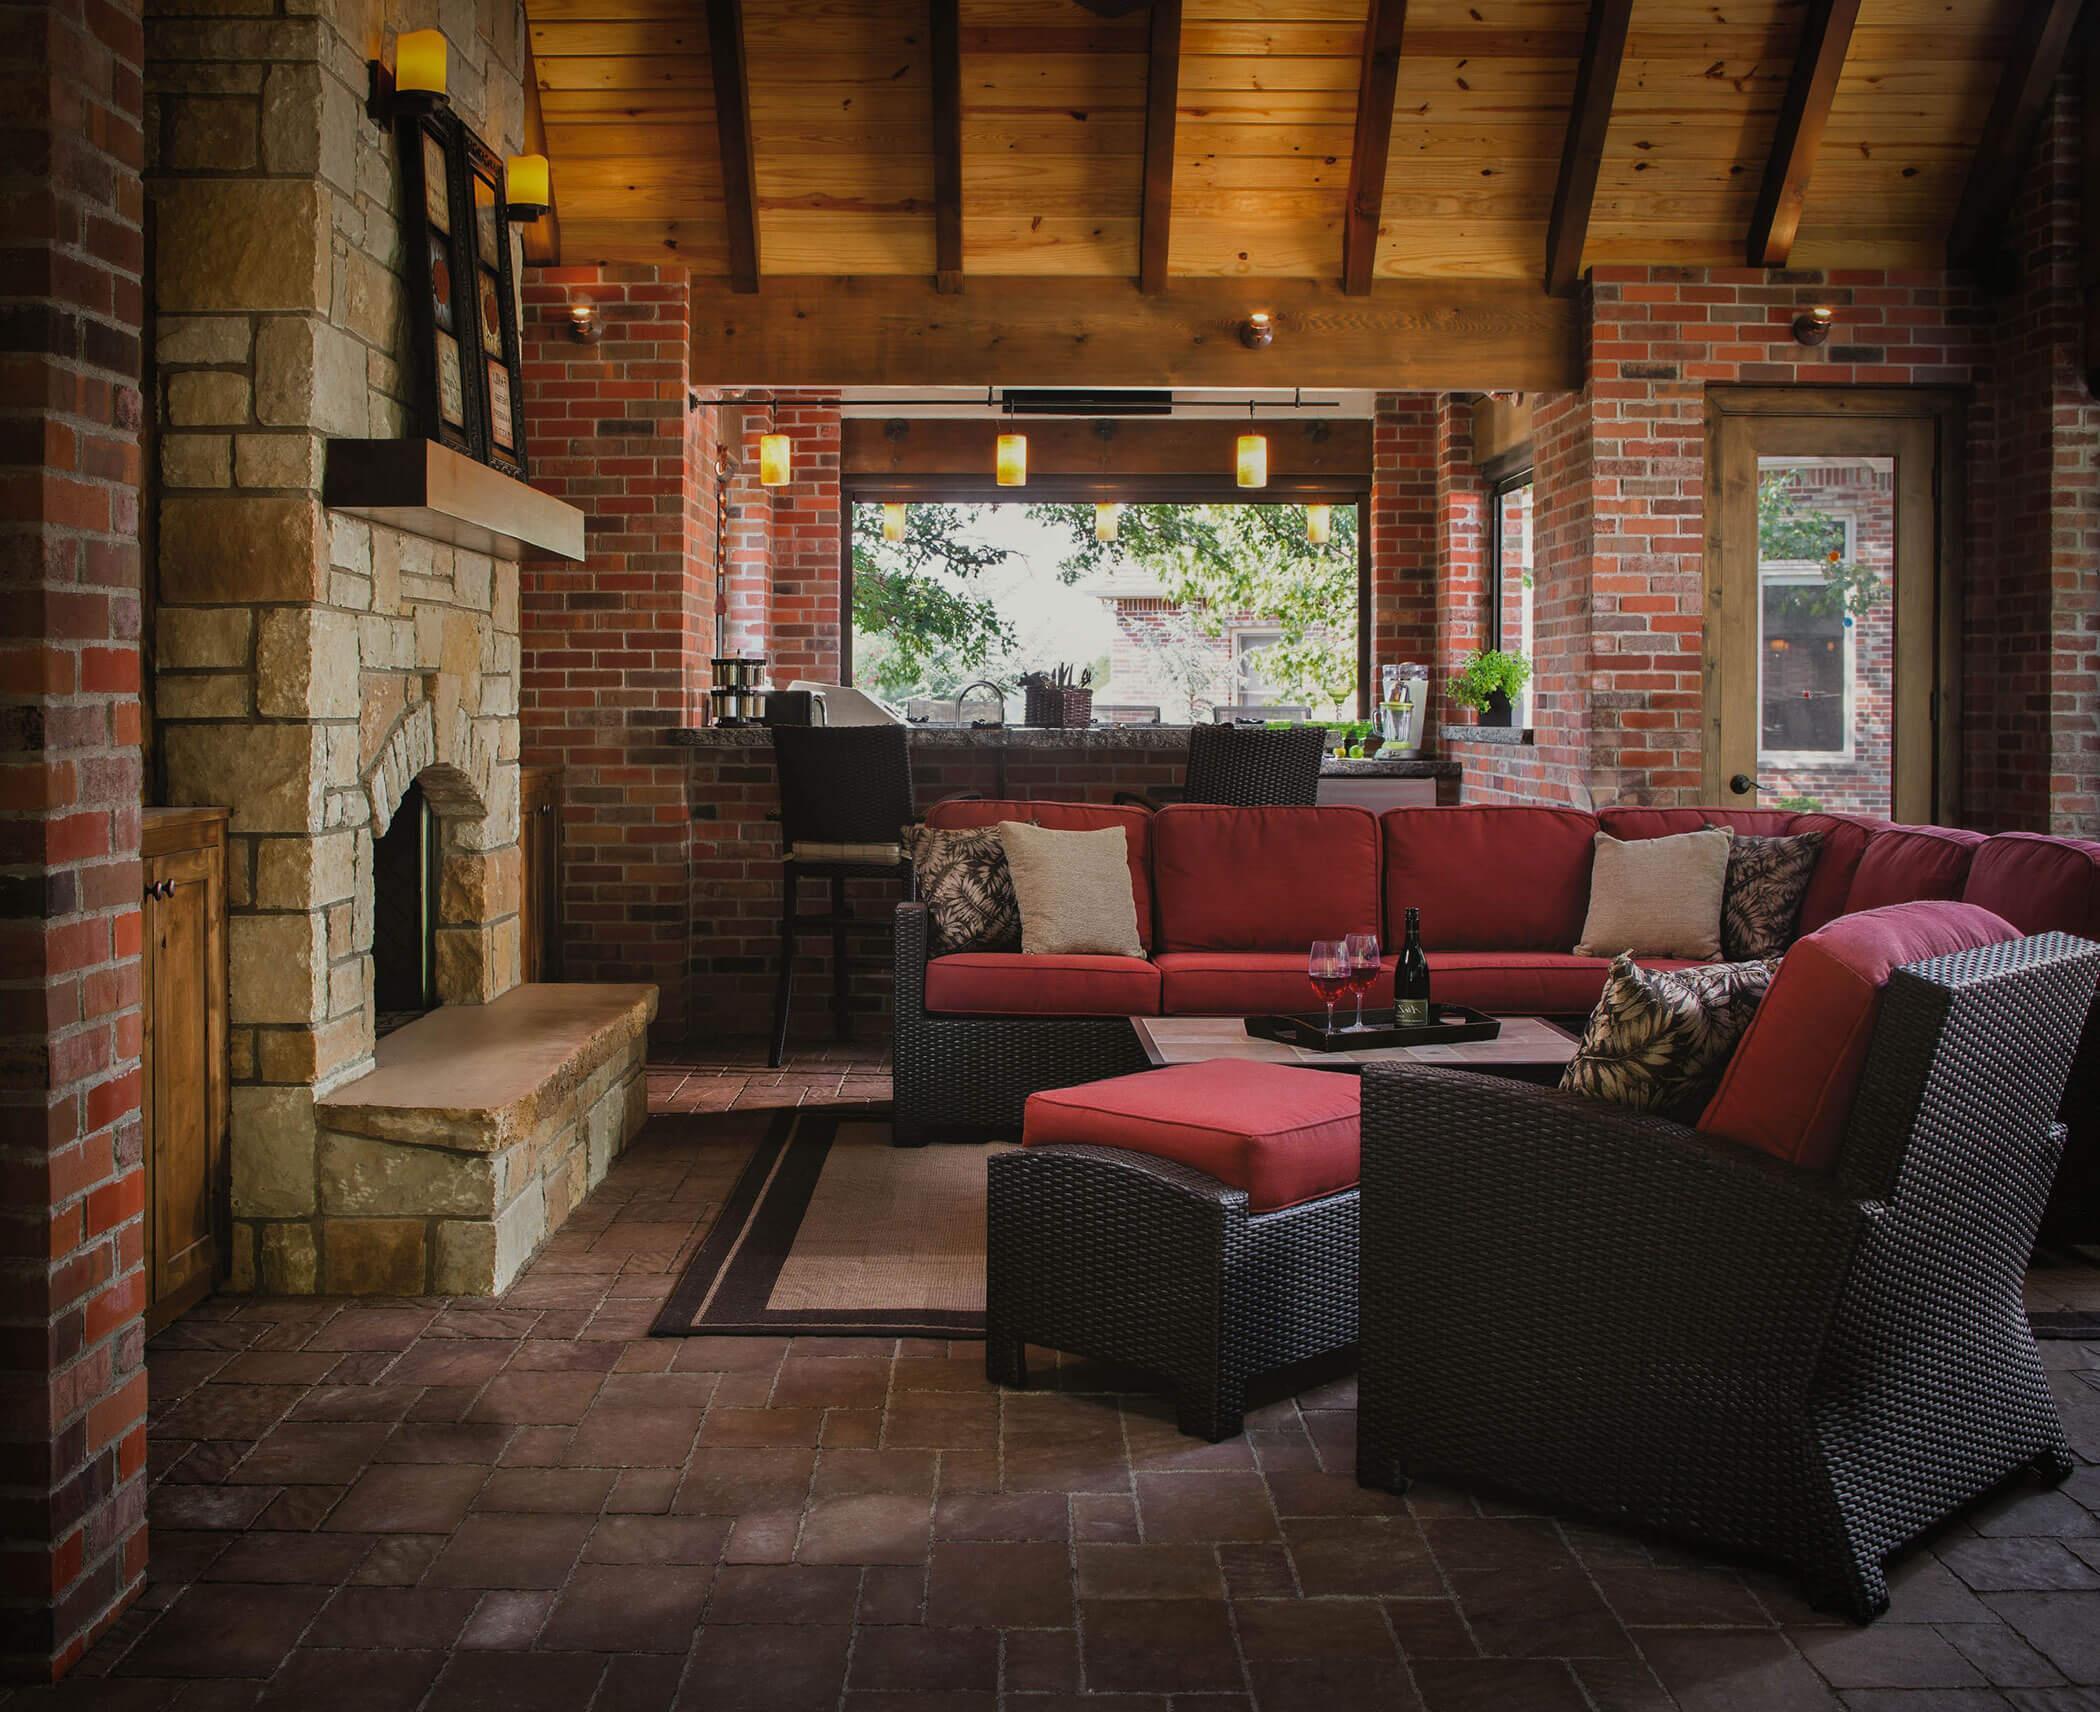 Elite Landscape & Outdoor Living - Denver, Colorado ... on Elite Landscape And Outdoor Living id=48891